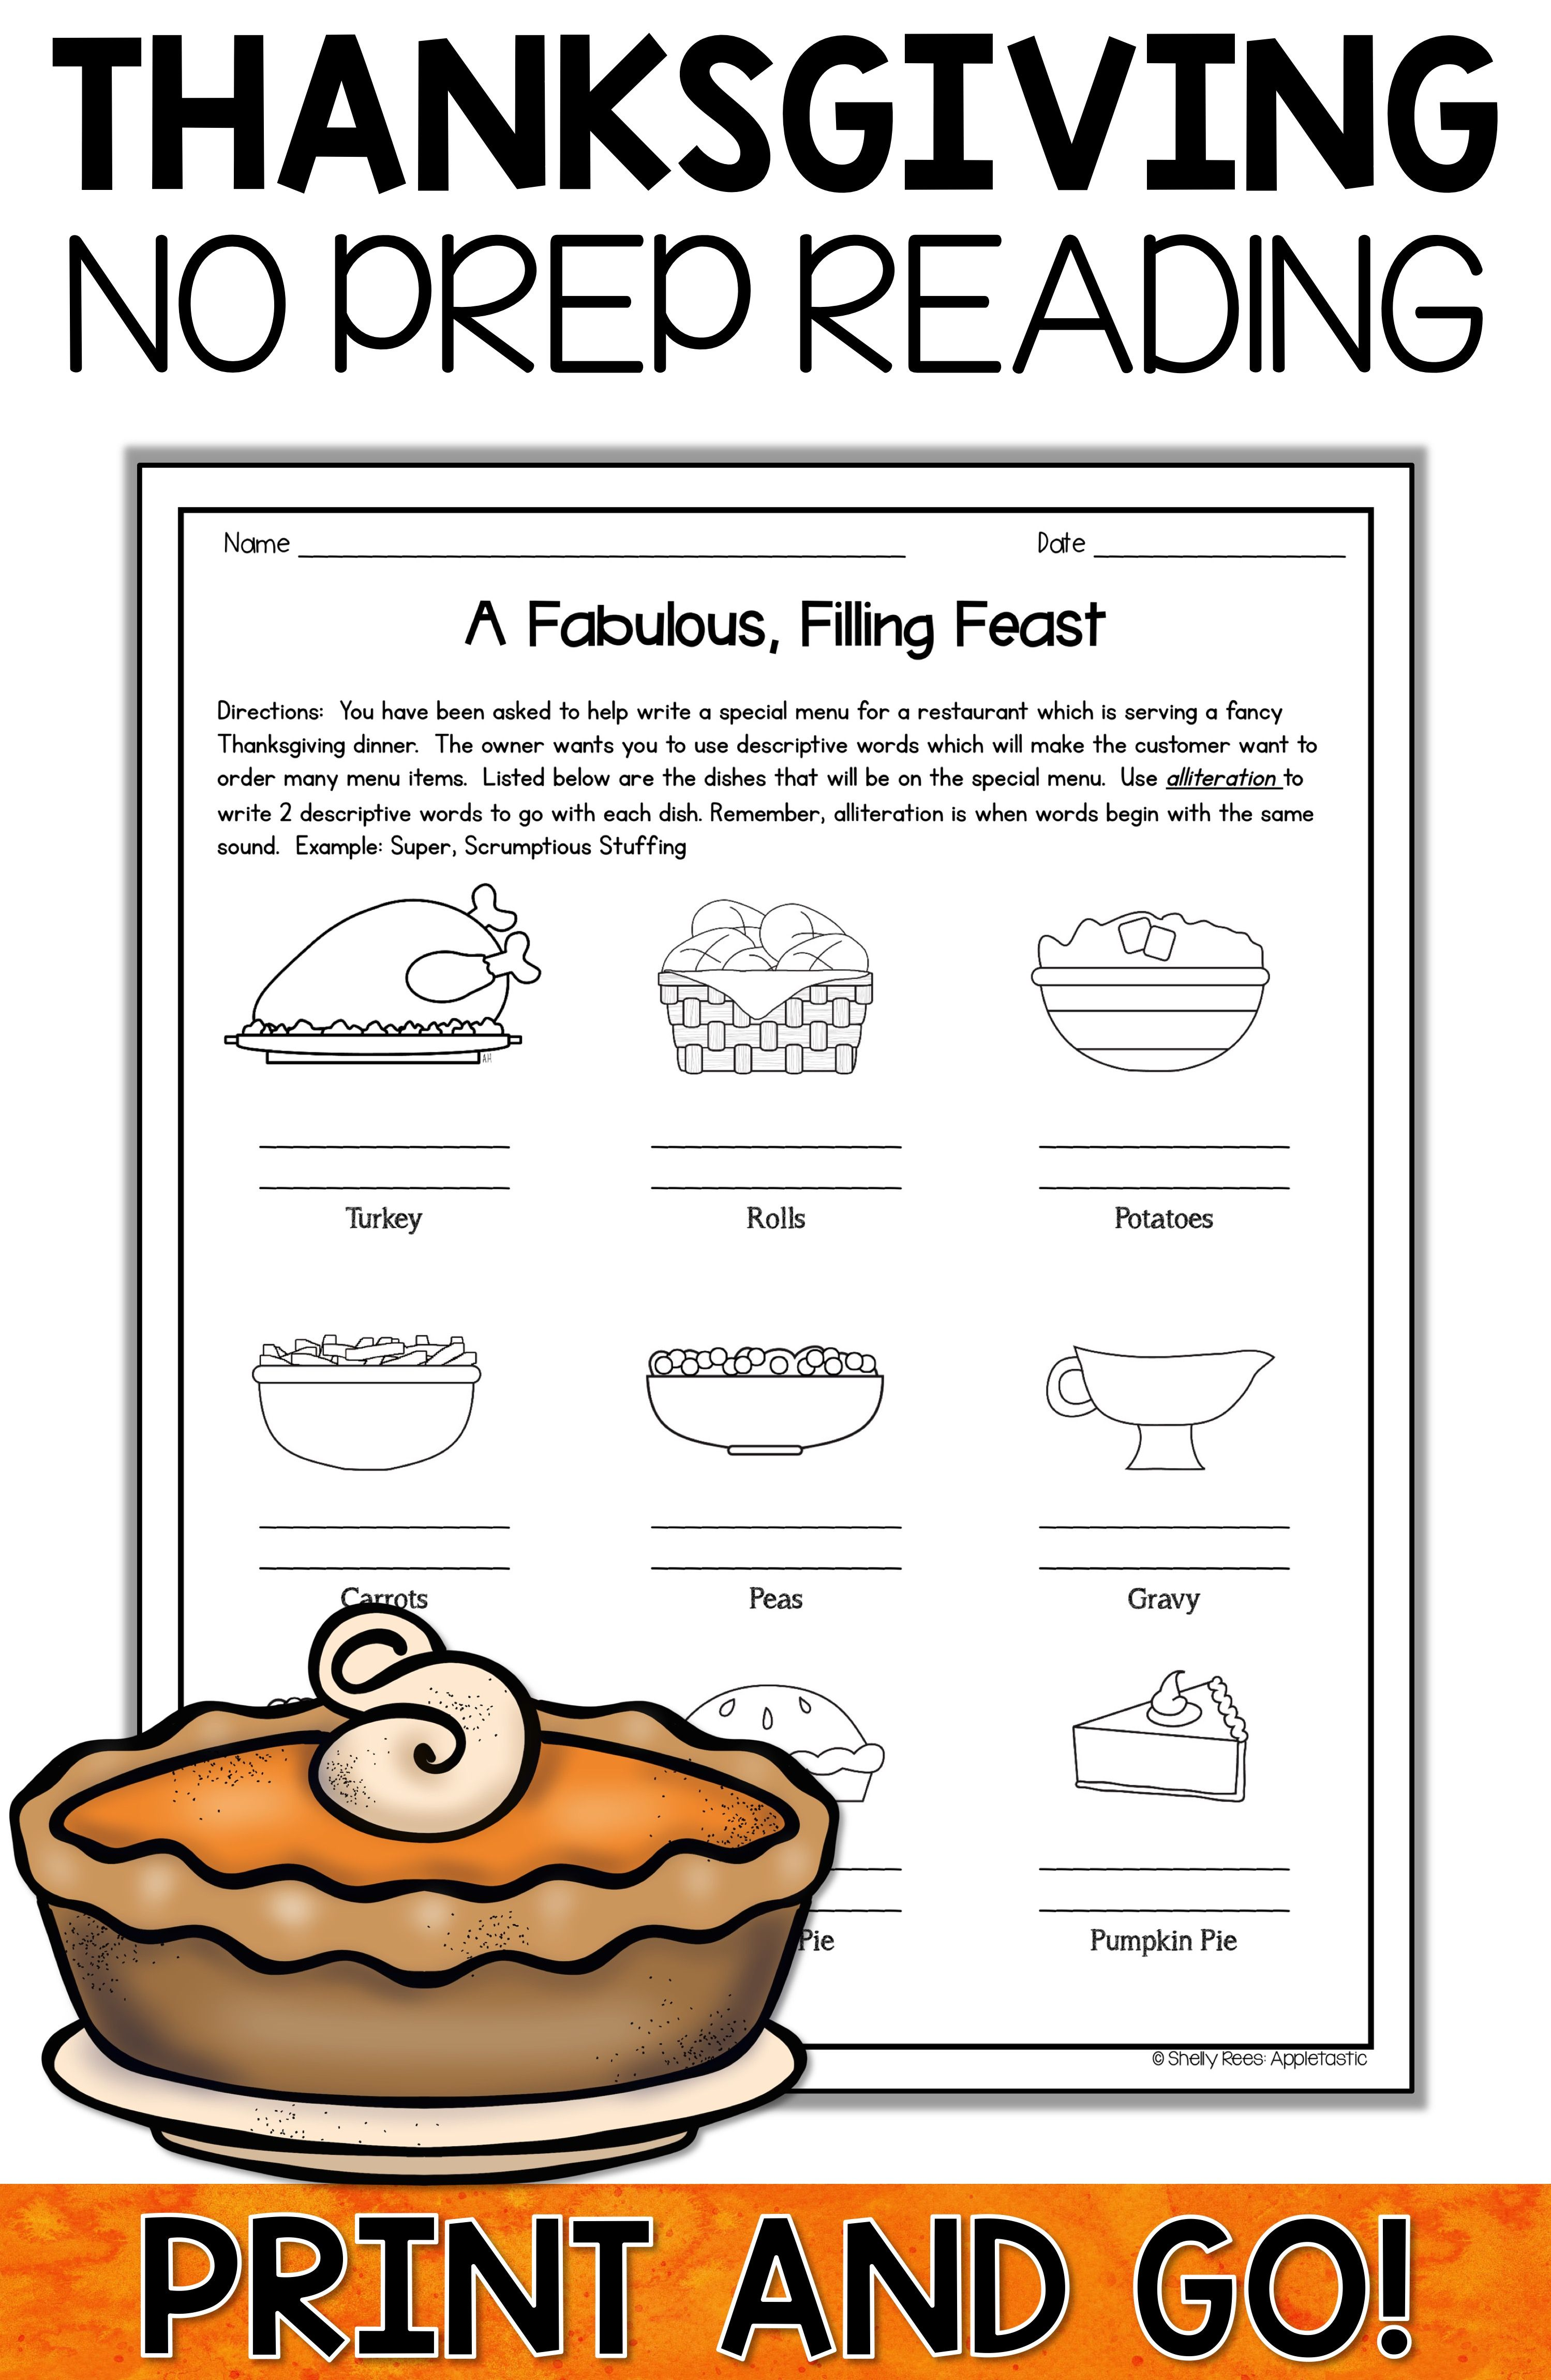 Thanksgiving Reading Worksheet Elementary